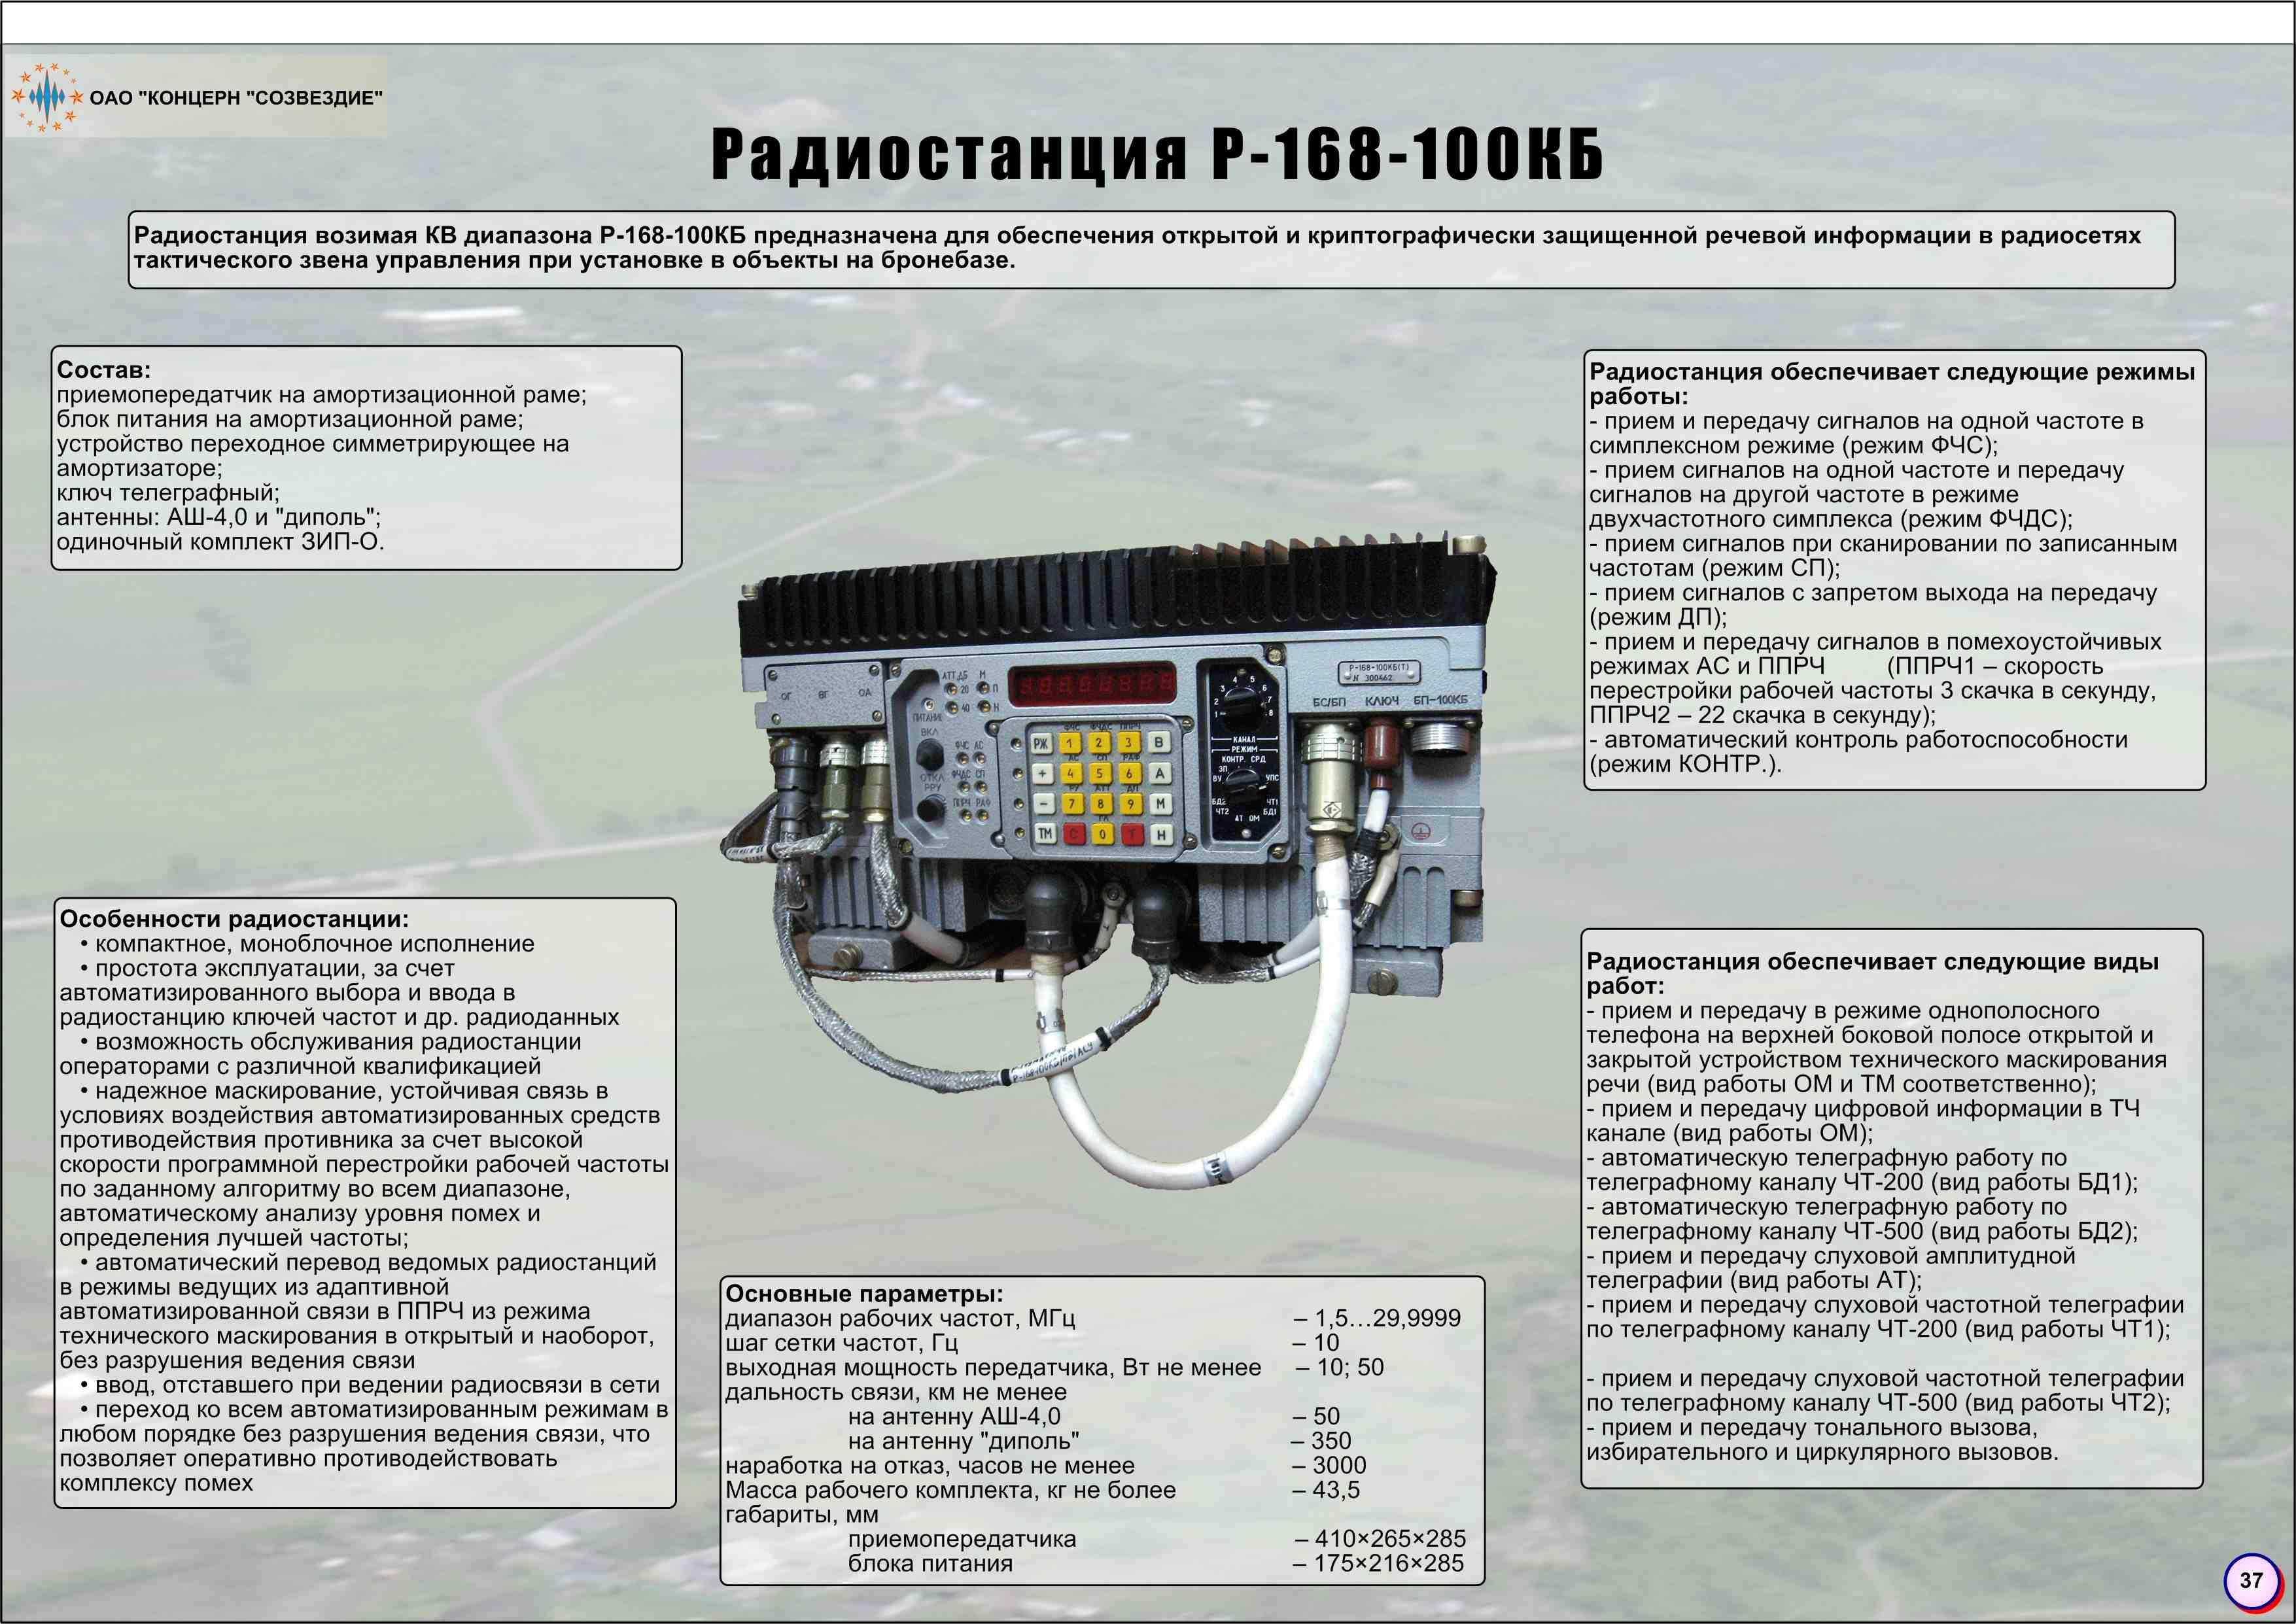 37_r-168-100kb